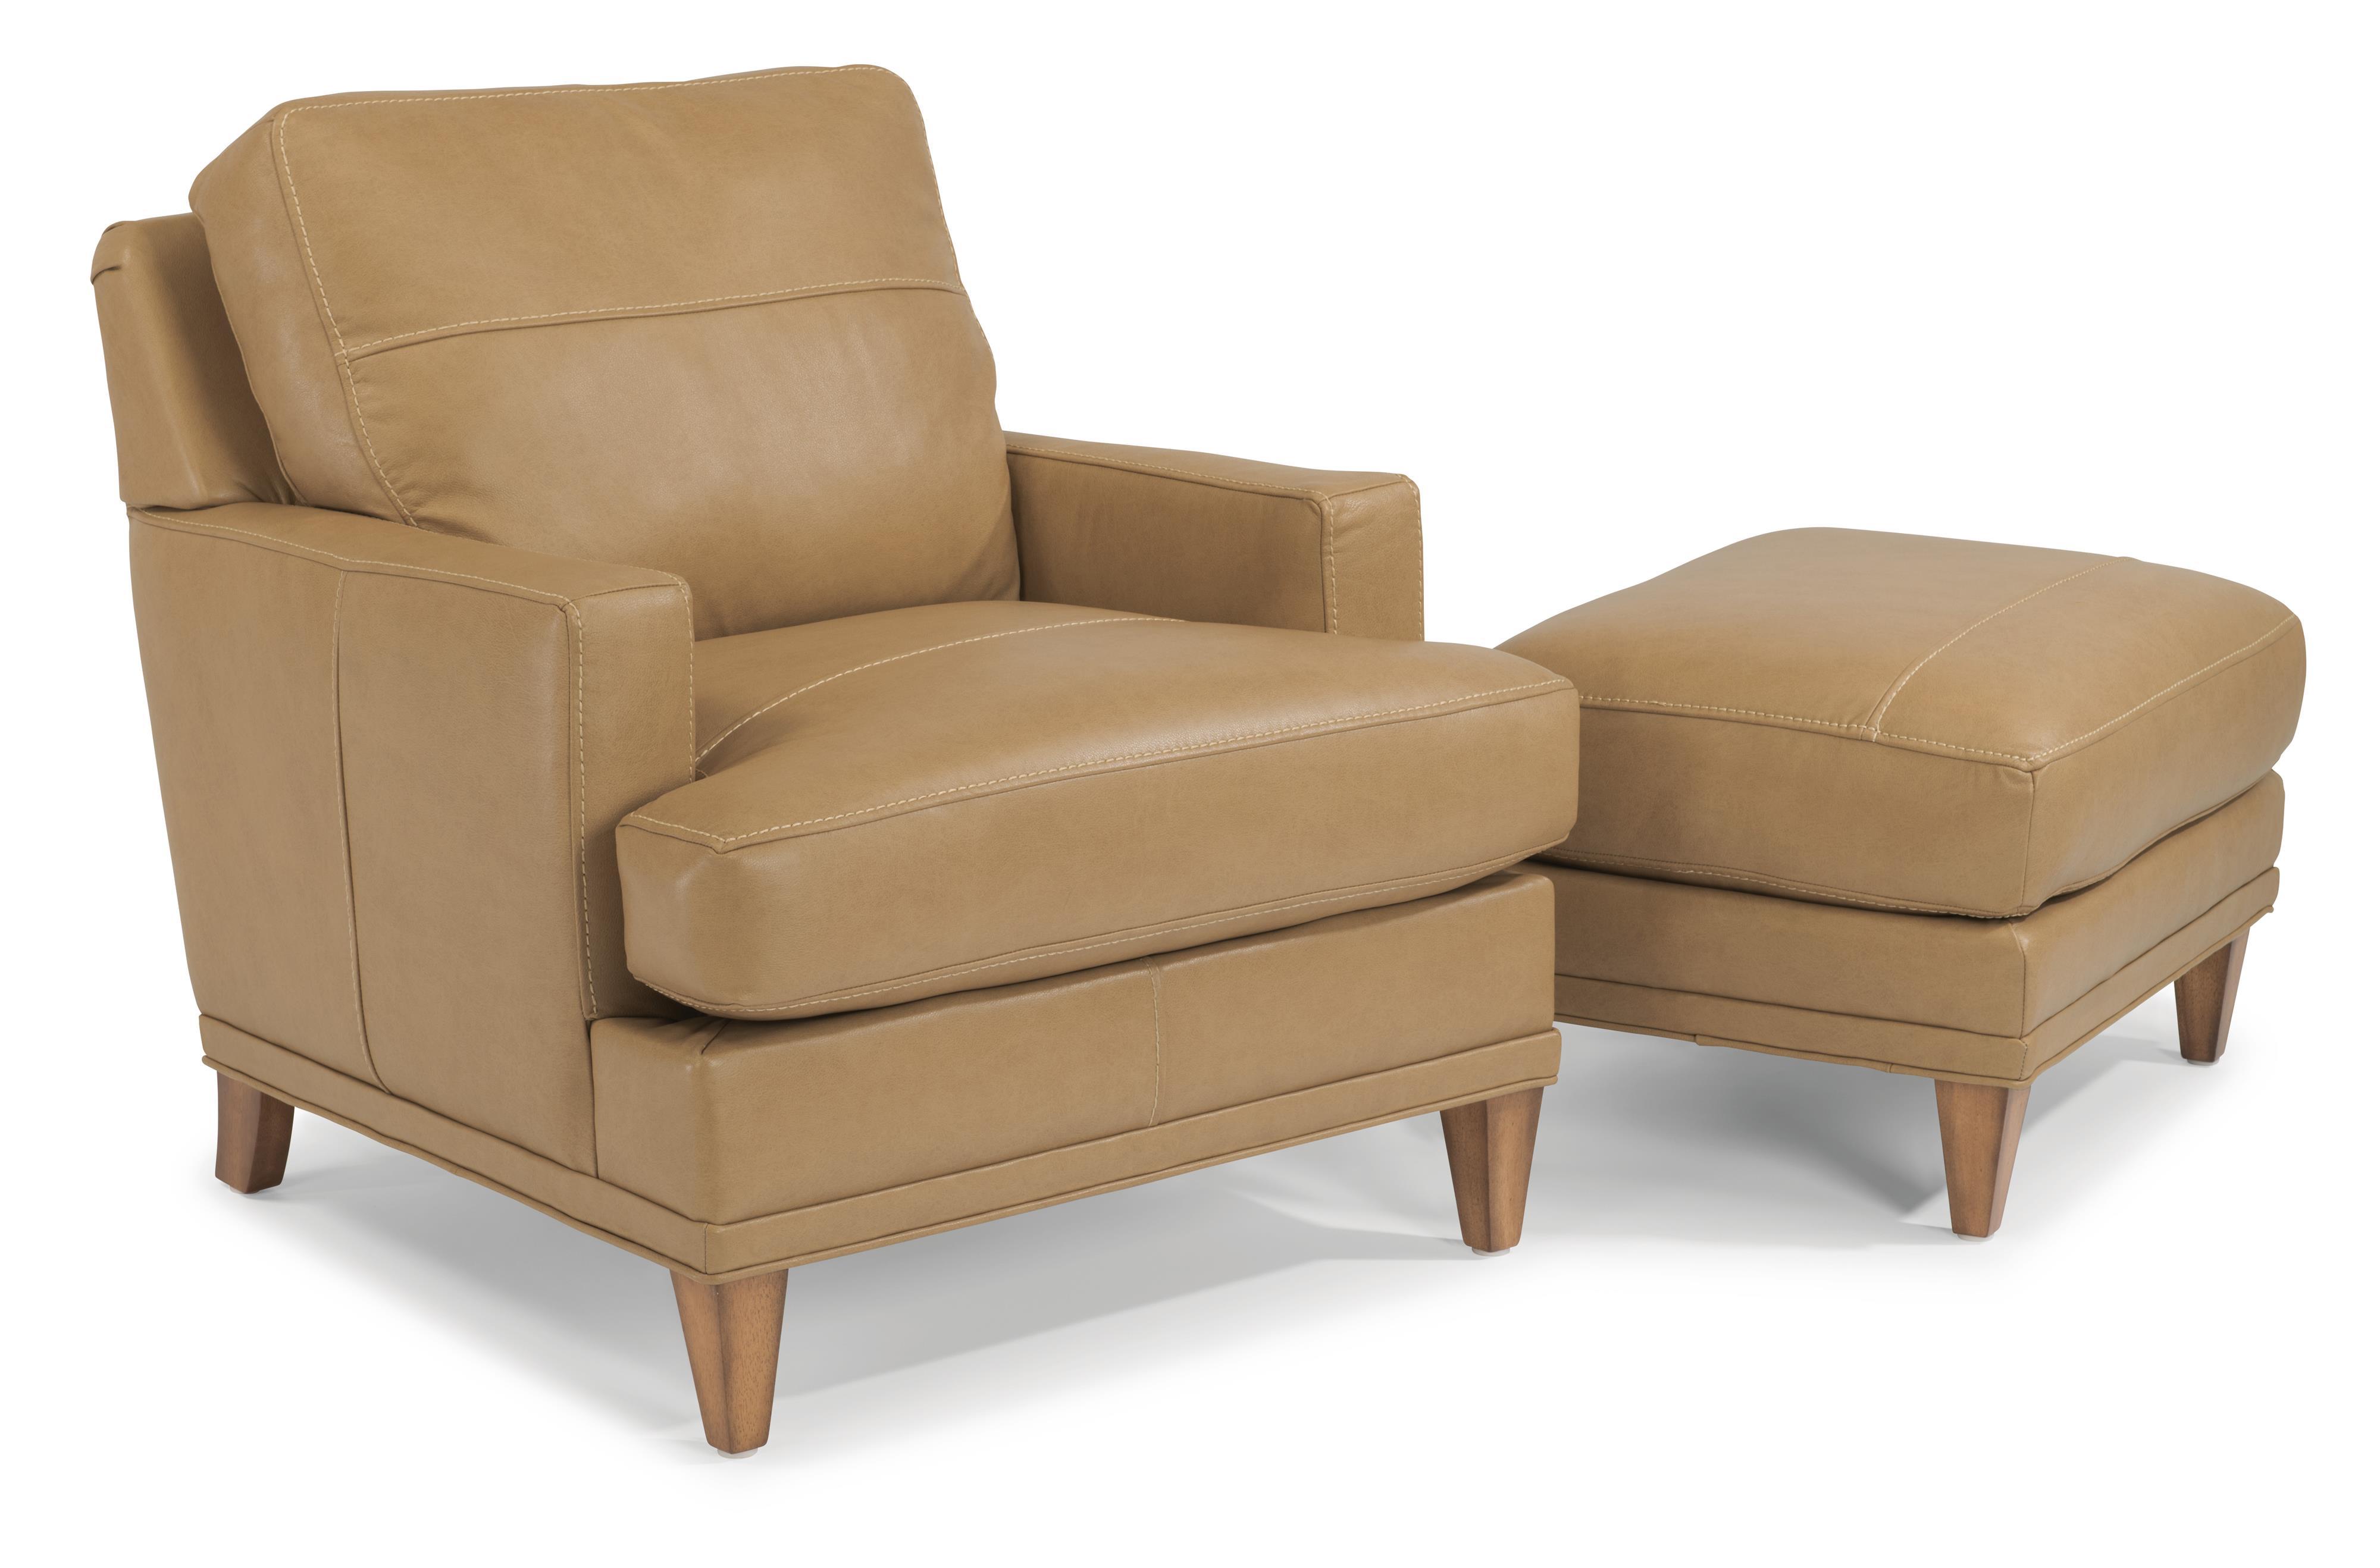 Flexsteel Ocean Chair & Ottoman Set (No Nails) - Item Number: B3368-10+B3368-08-174-80